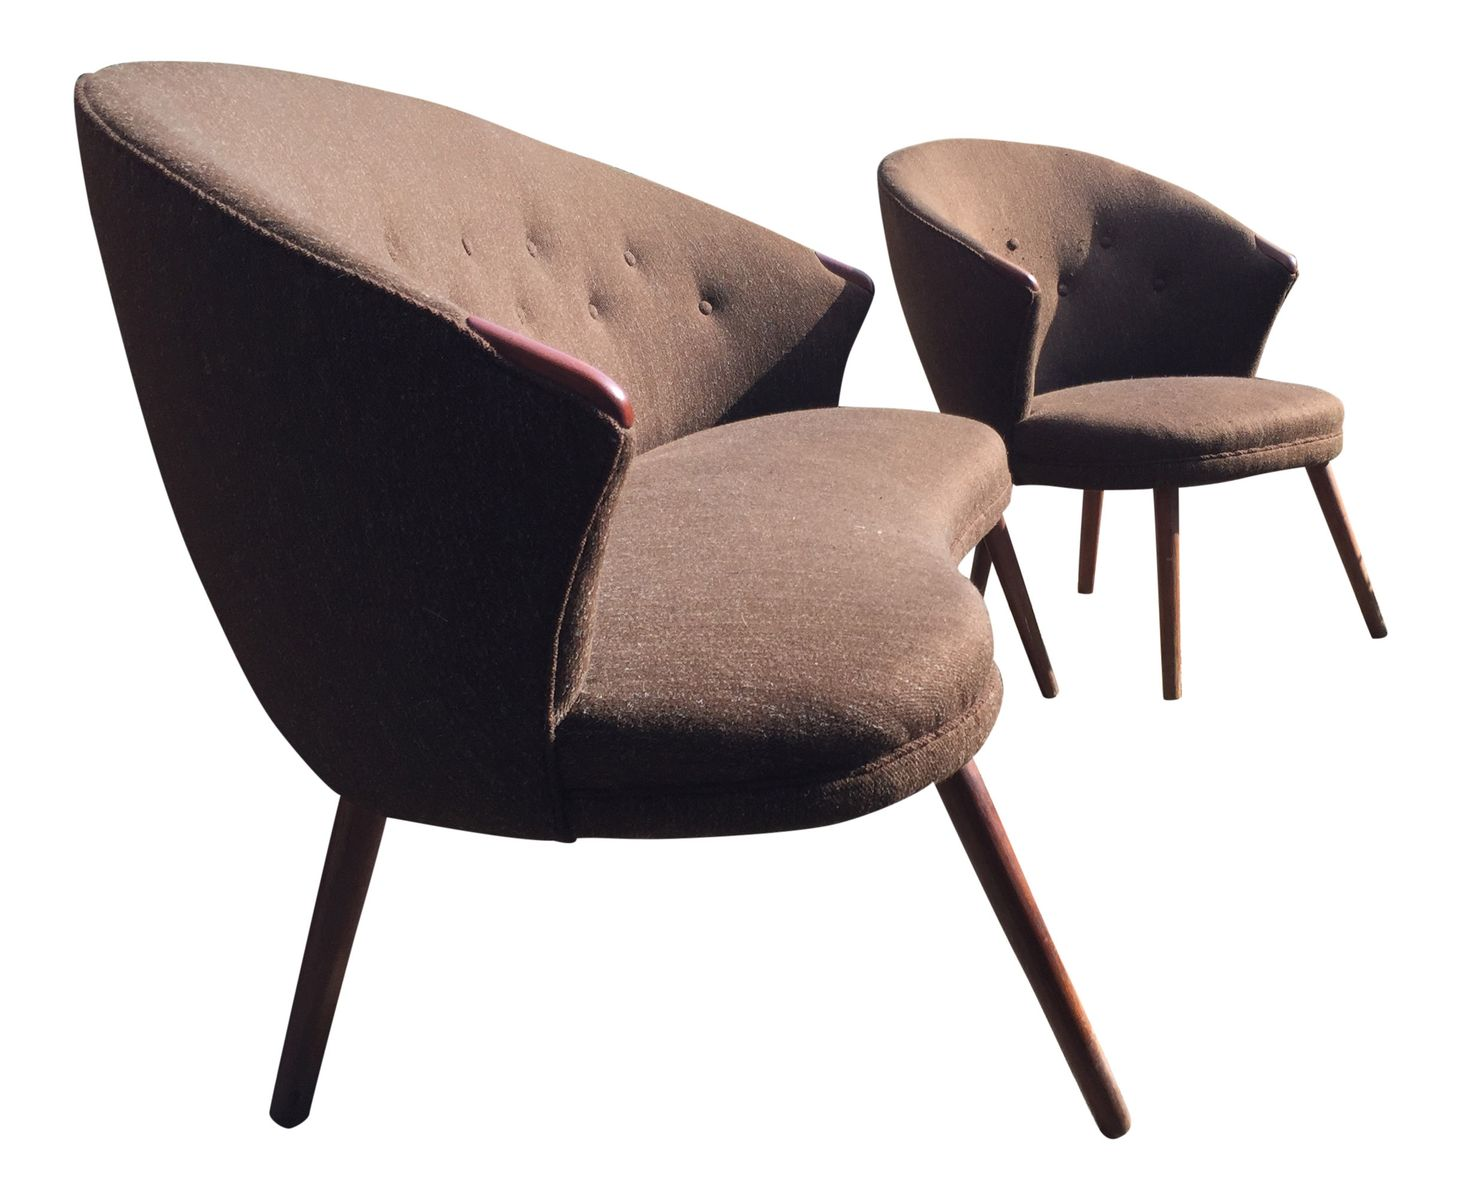 vintage sofa und sessel 1960er bei pamono kaufen. Black Bedroom Furniture Sets. Home Design Ideas